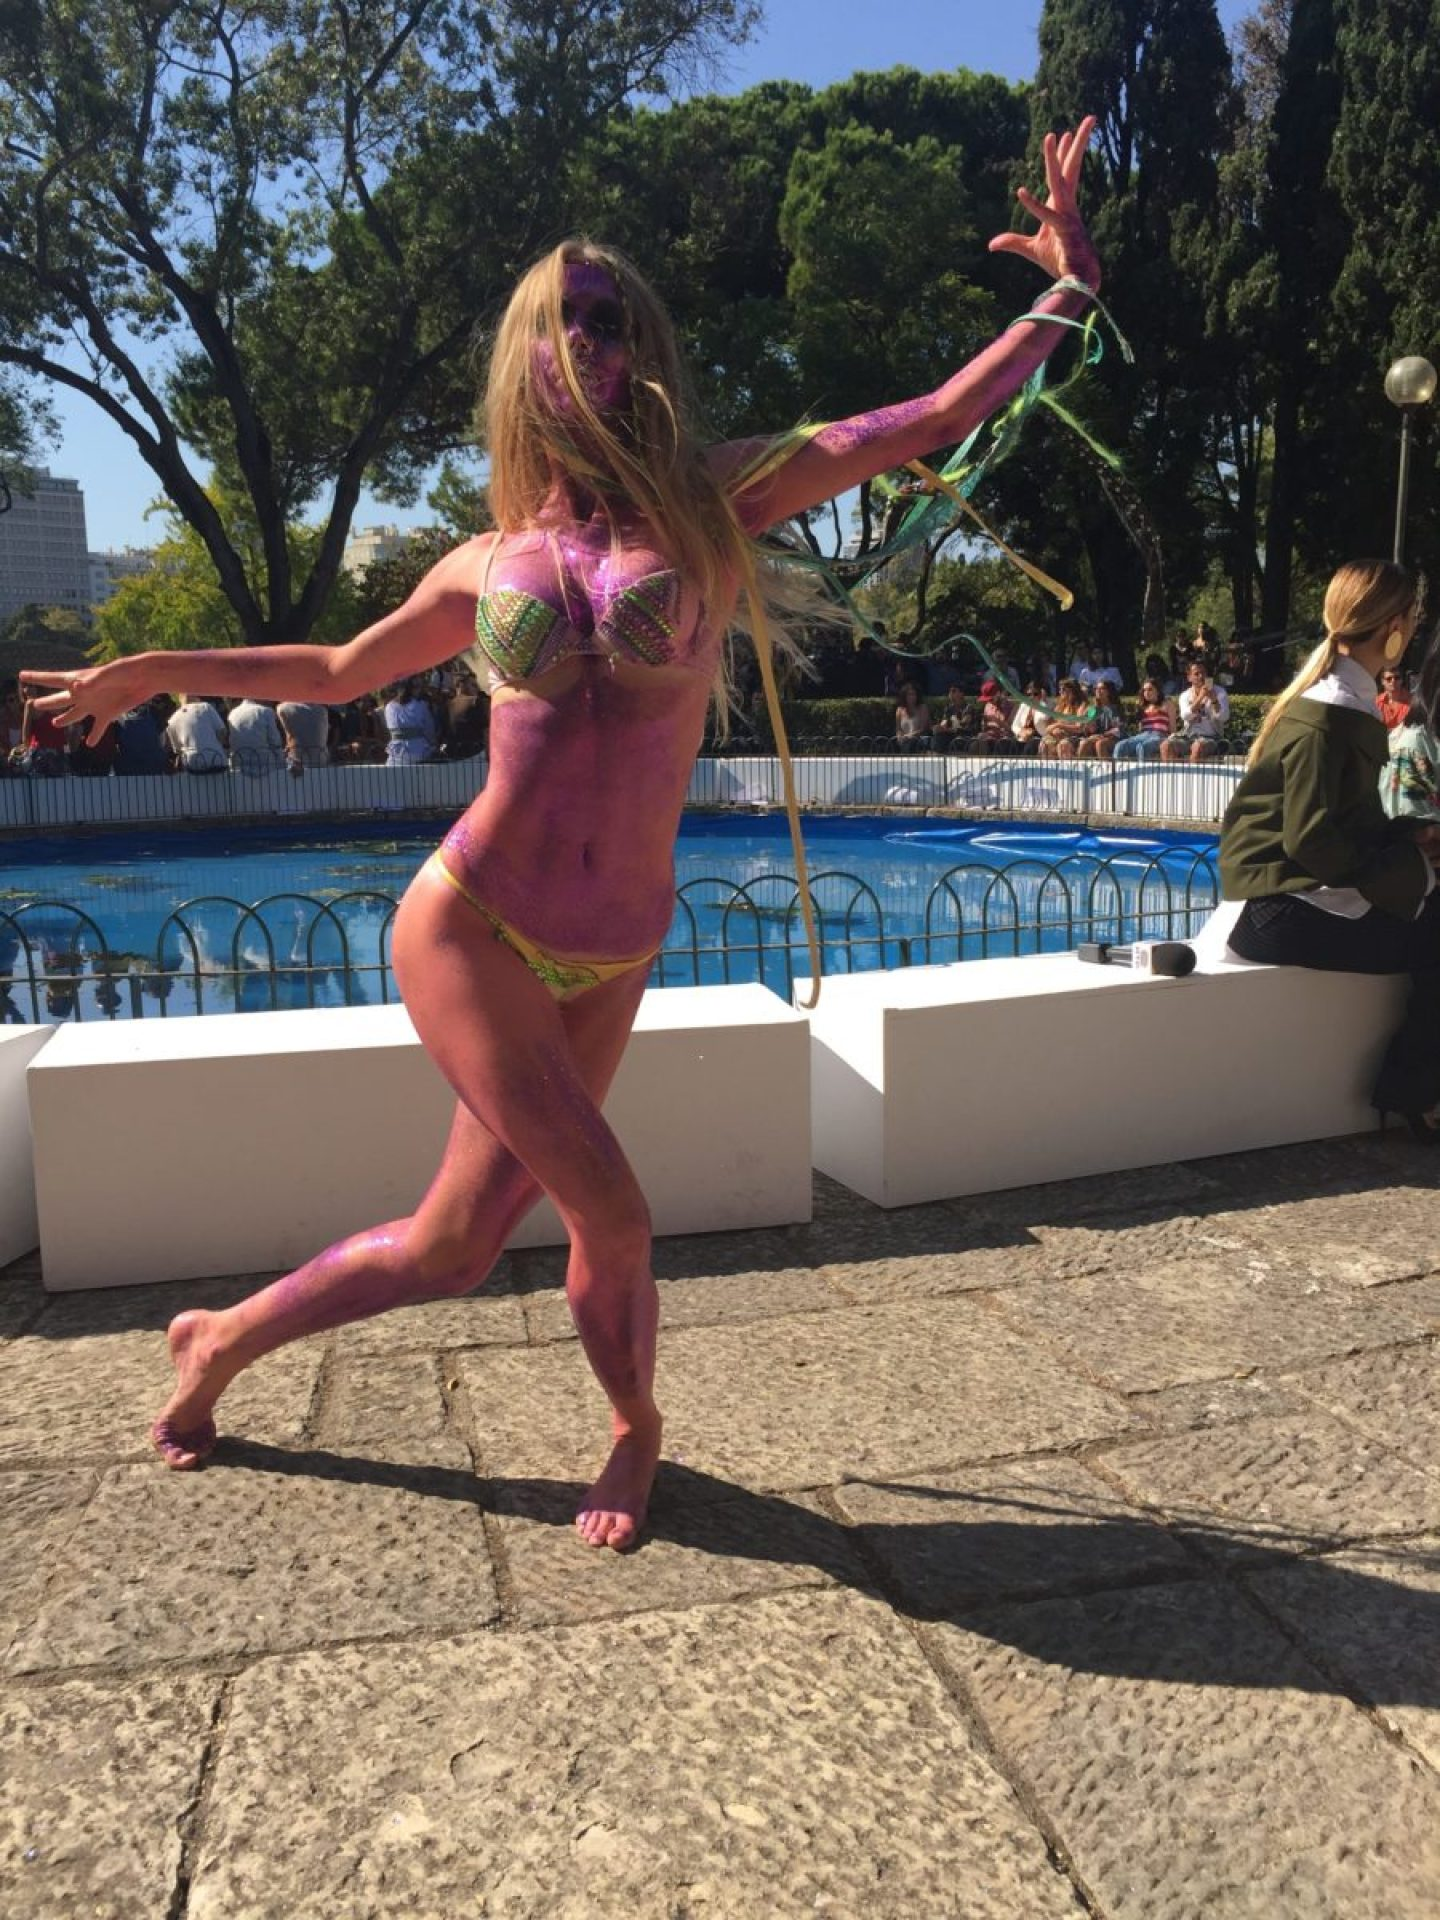 lisboa fashion week spring summer 2018 pavilhão carlos lopes